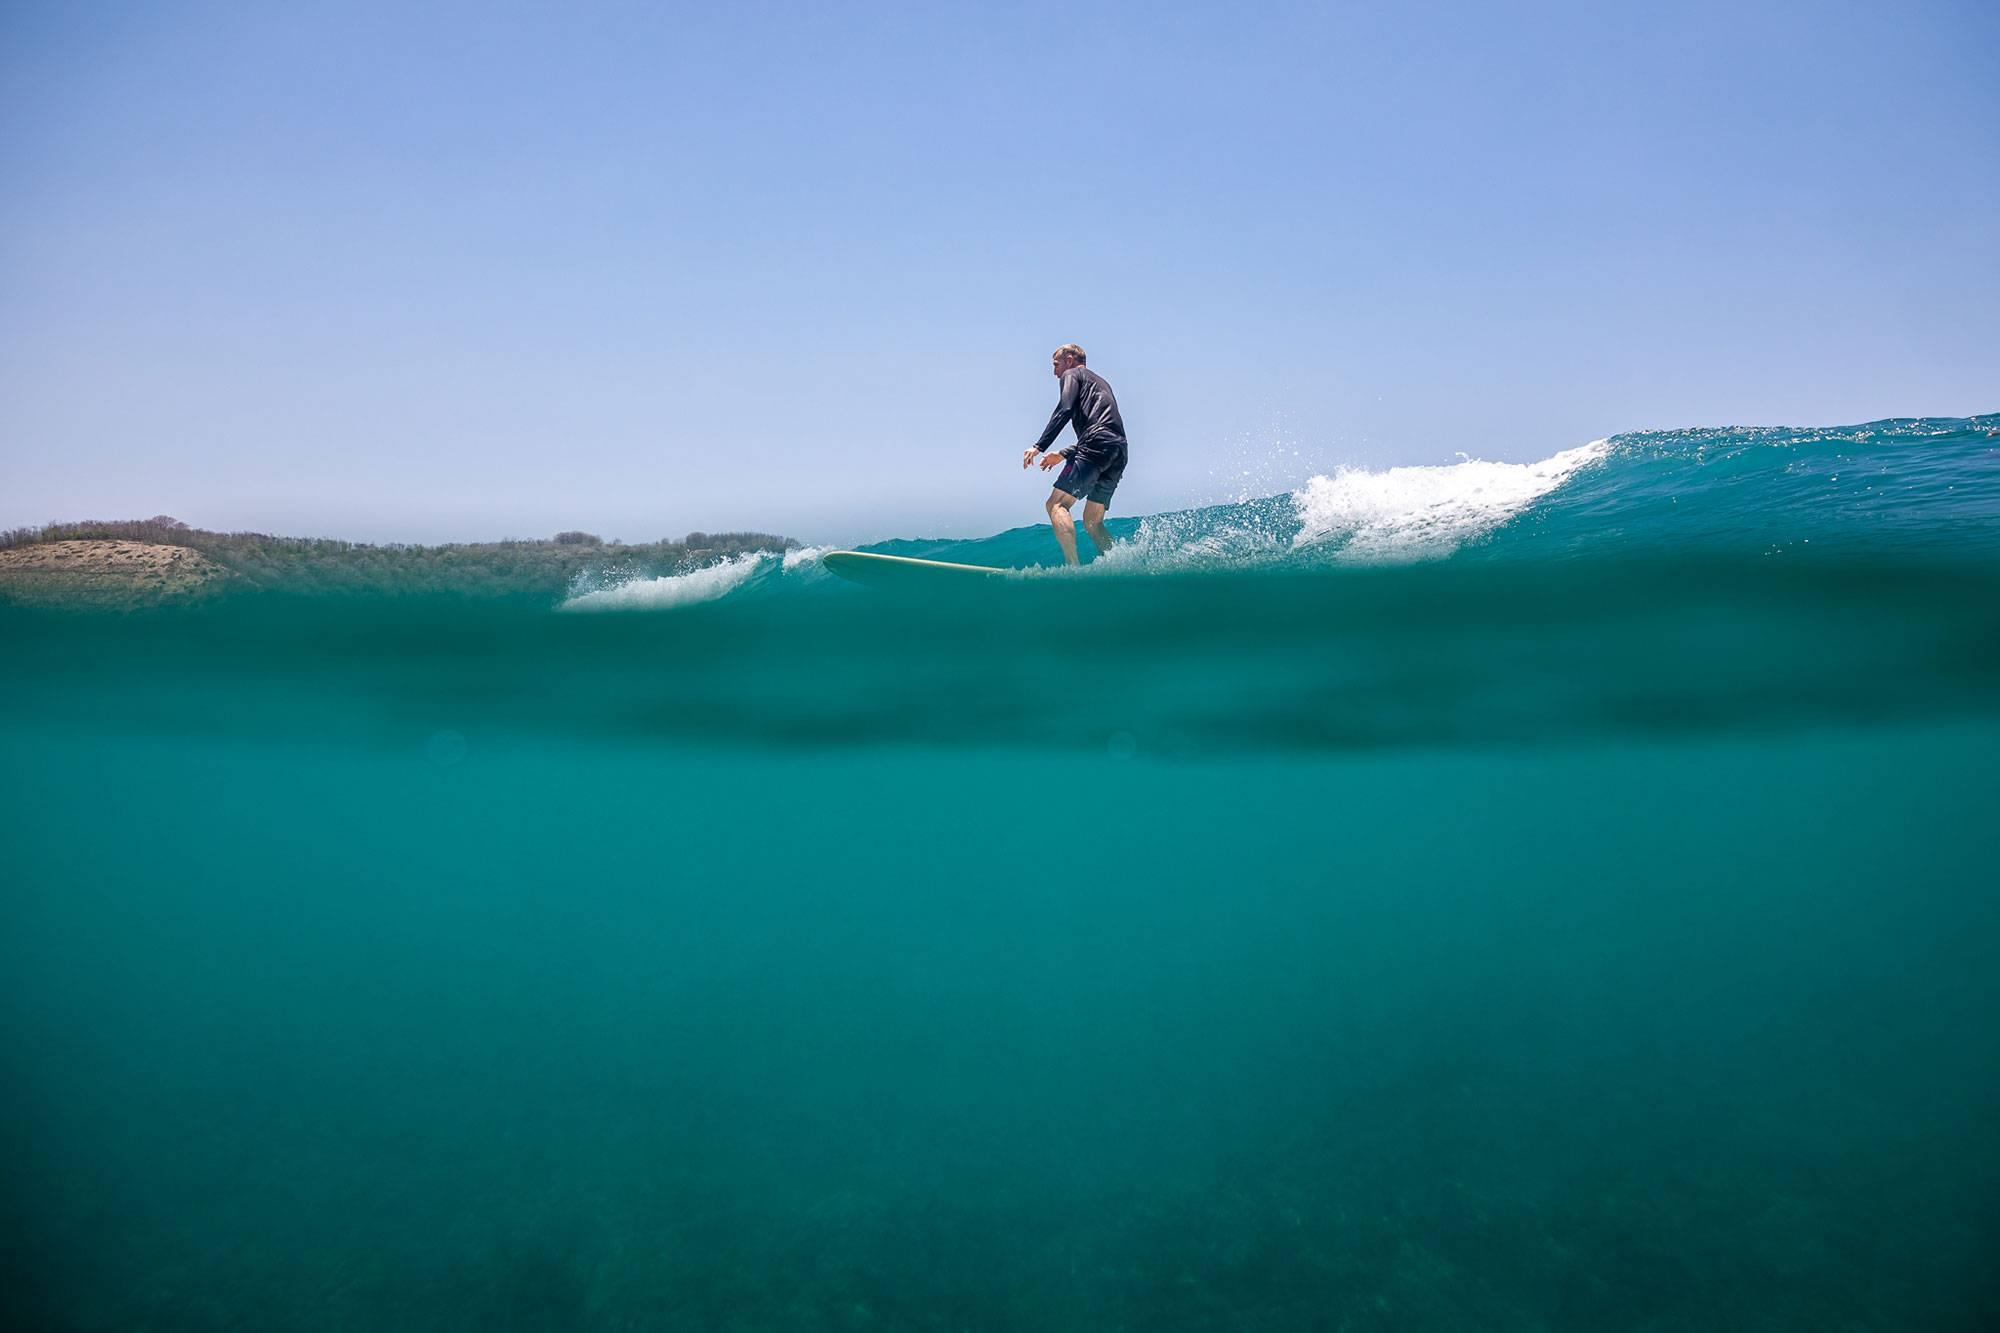 https://www.soulandsurf.com/wp-content/uploads/2021/08/lombok-pop-up-2019-Copy-of-Lombok-pop-up-@peterchamberlainphotoI11A0709.jpg Image